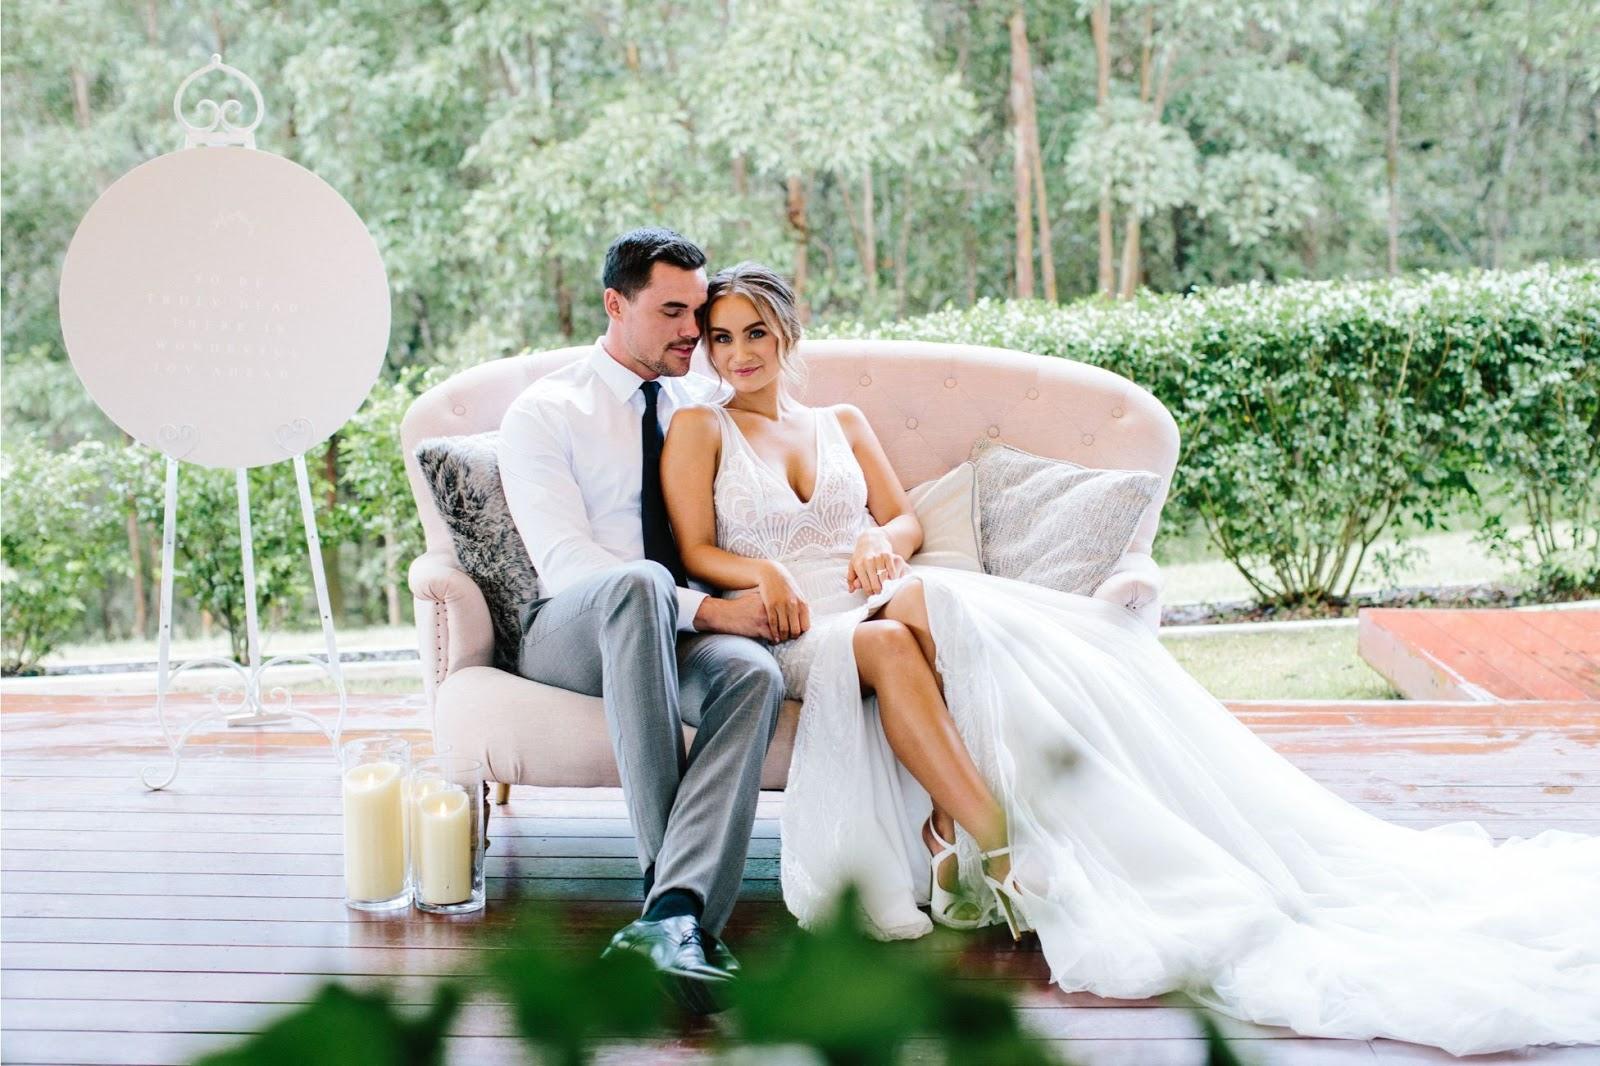 STYLED: FRENCH PROVINCIAL WEDDING INSPIRATION | AUSTINVILLA ESTATE MUDGEERABA QLD